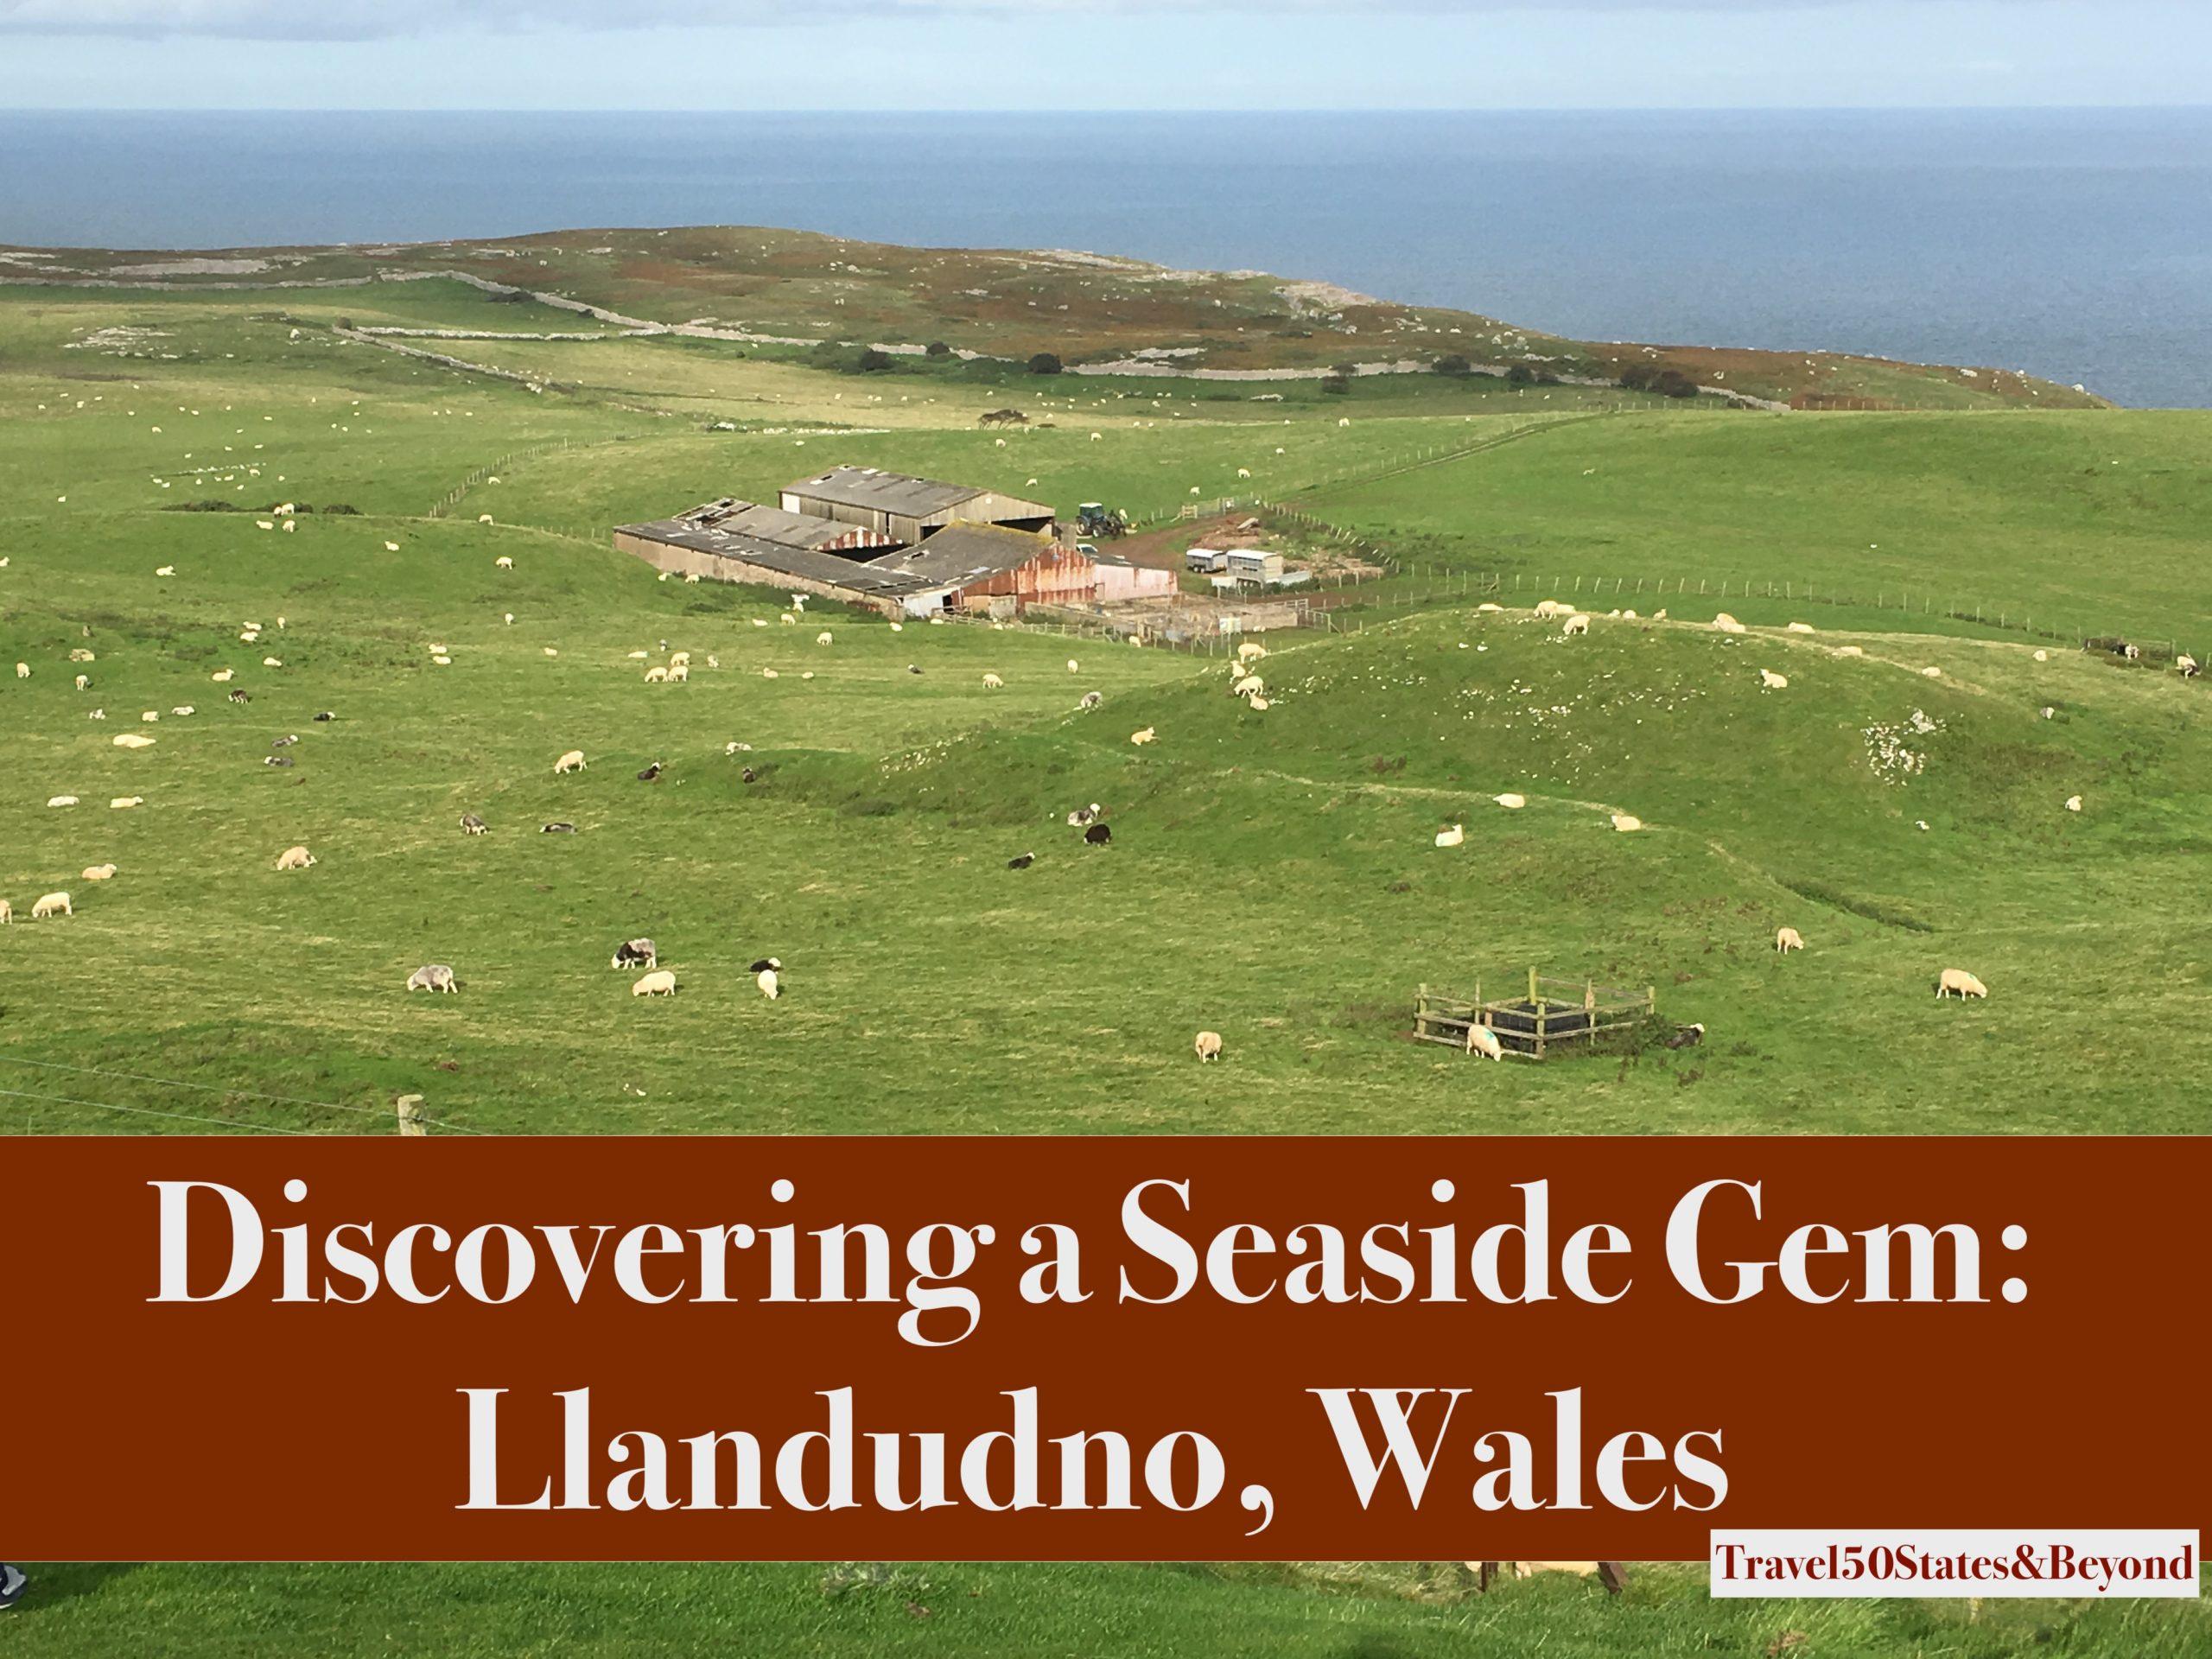 Discovering a Seaside Gem in Llandudno, Wales